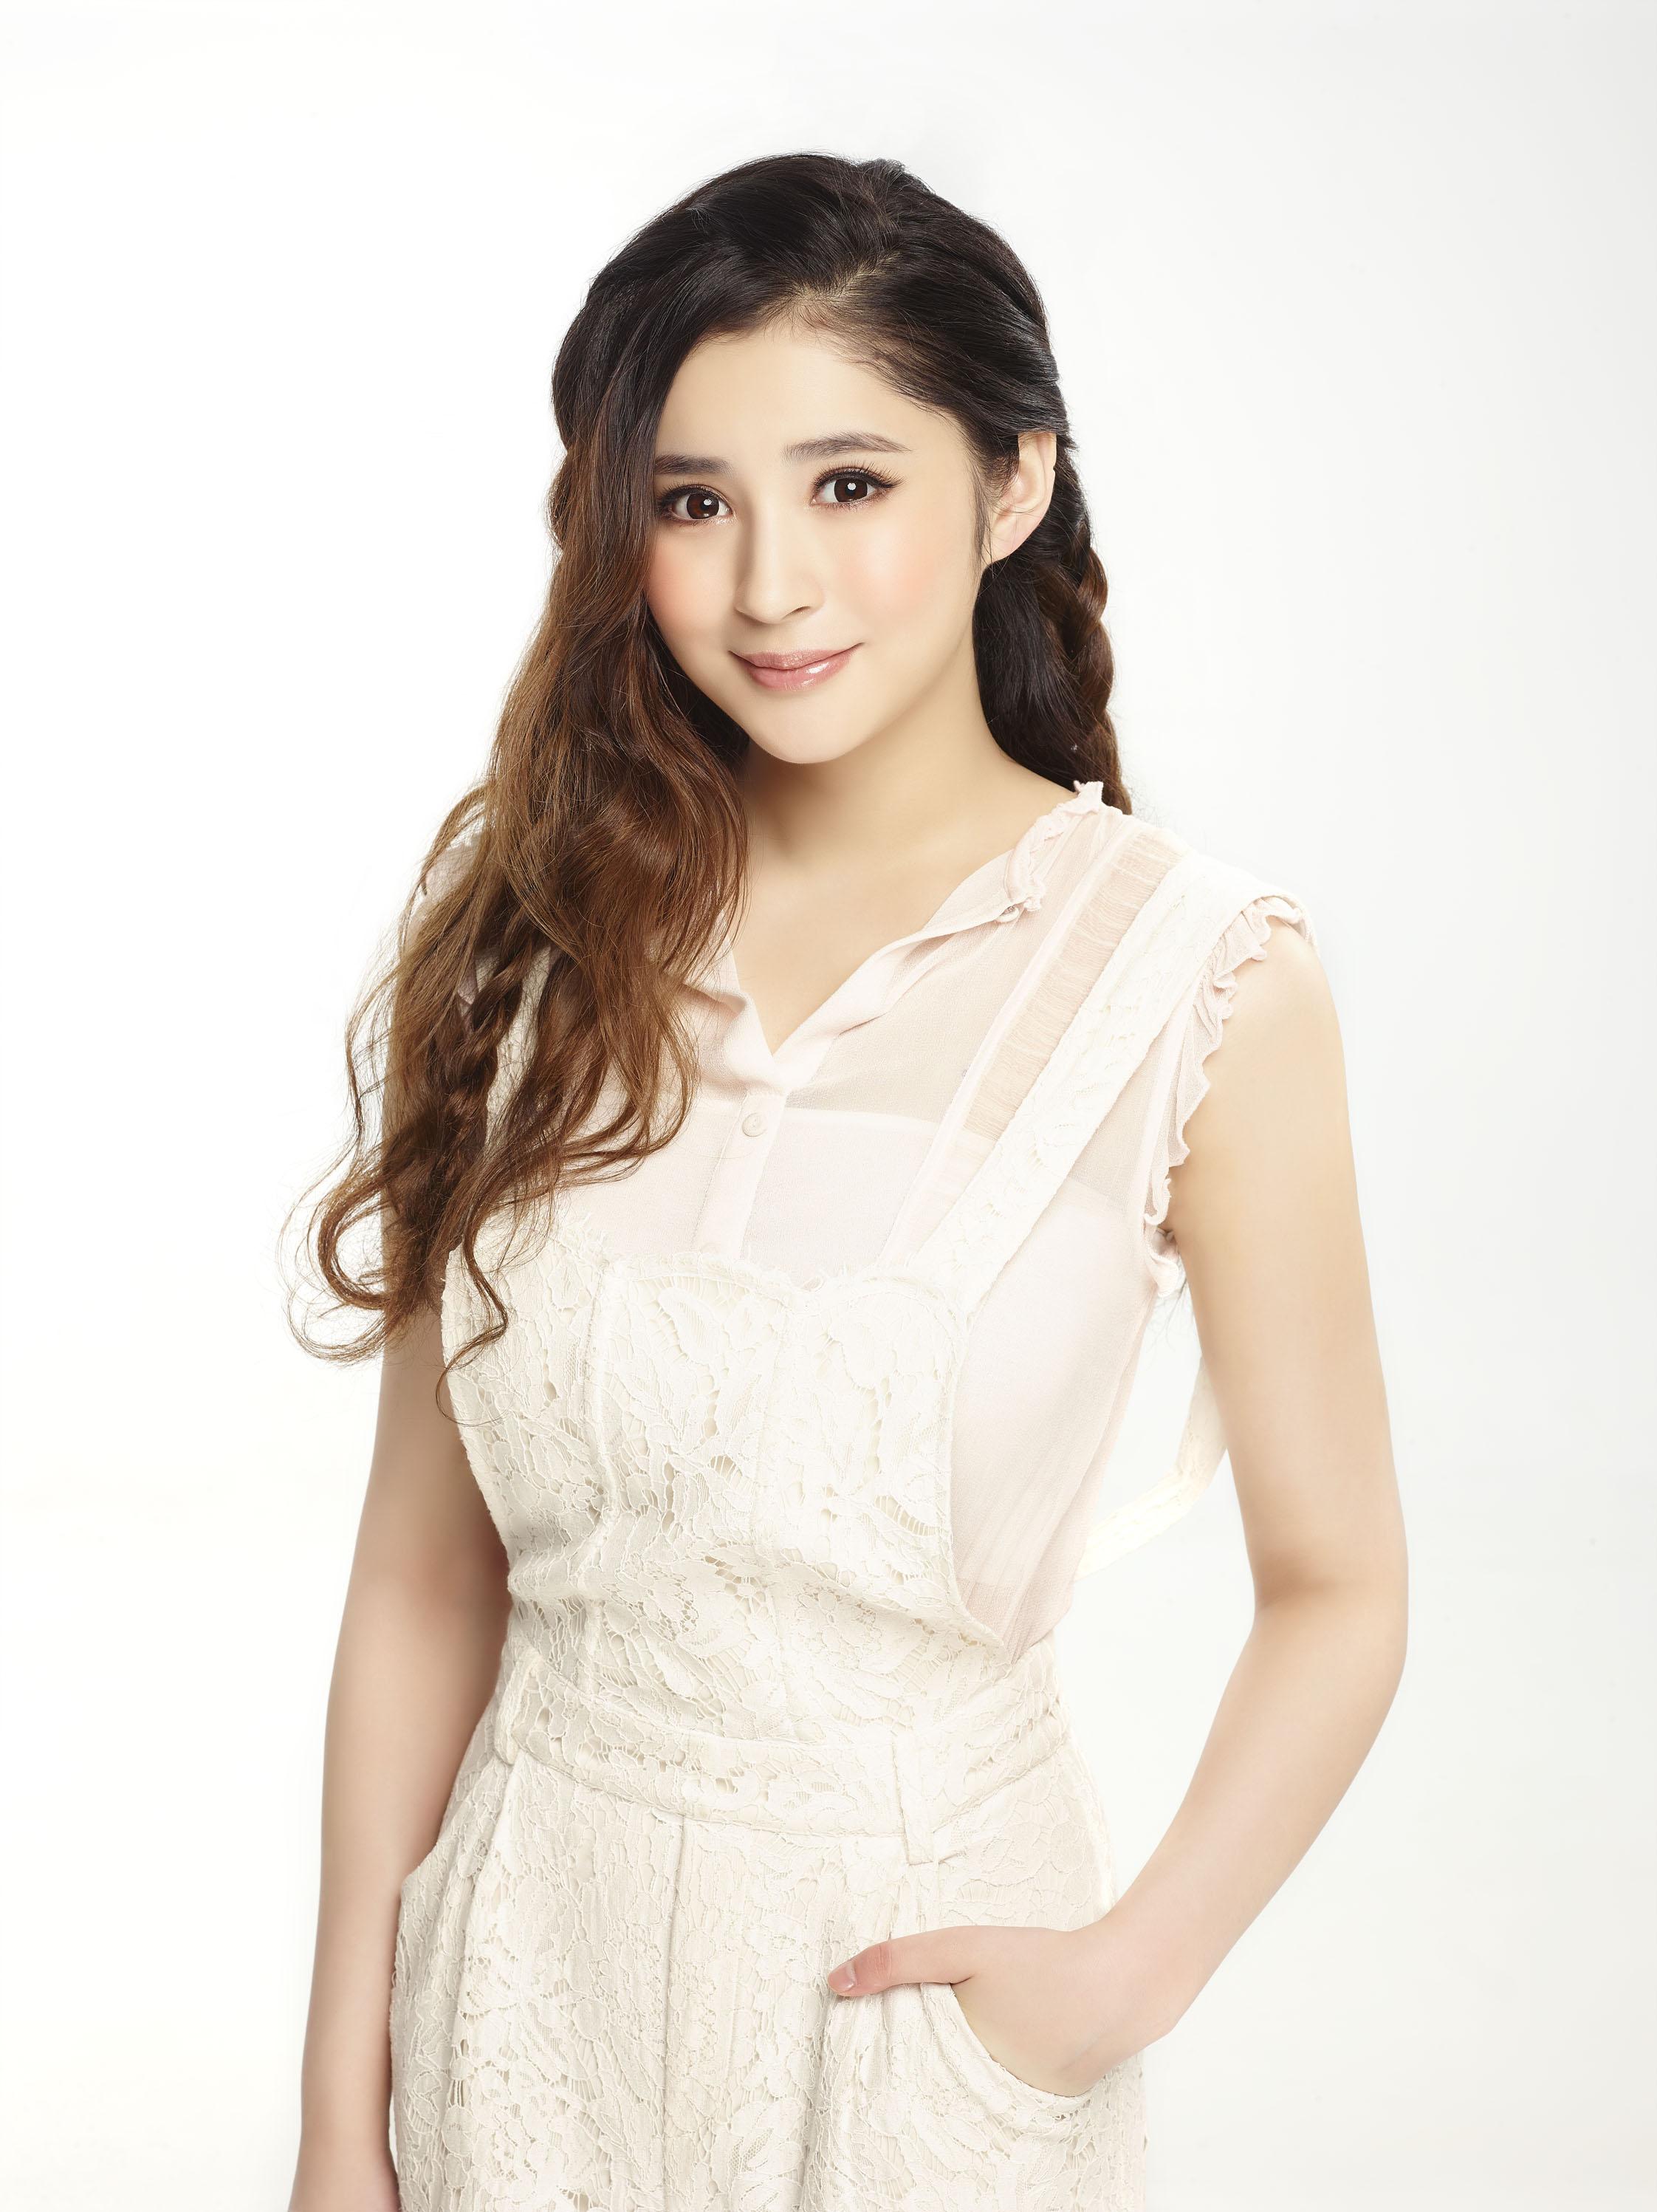 Hsin Ai Lee - IMDb